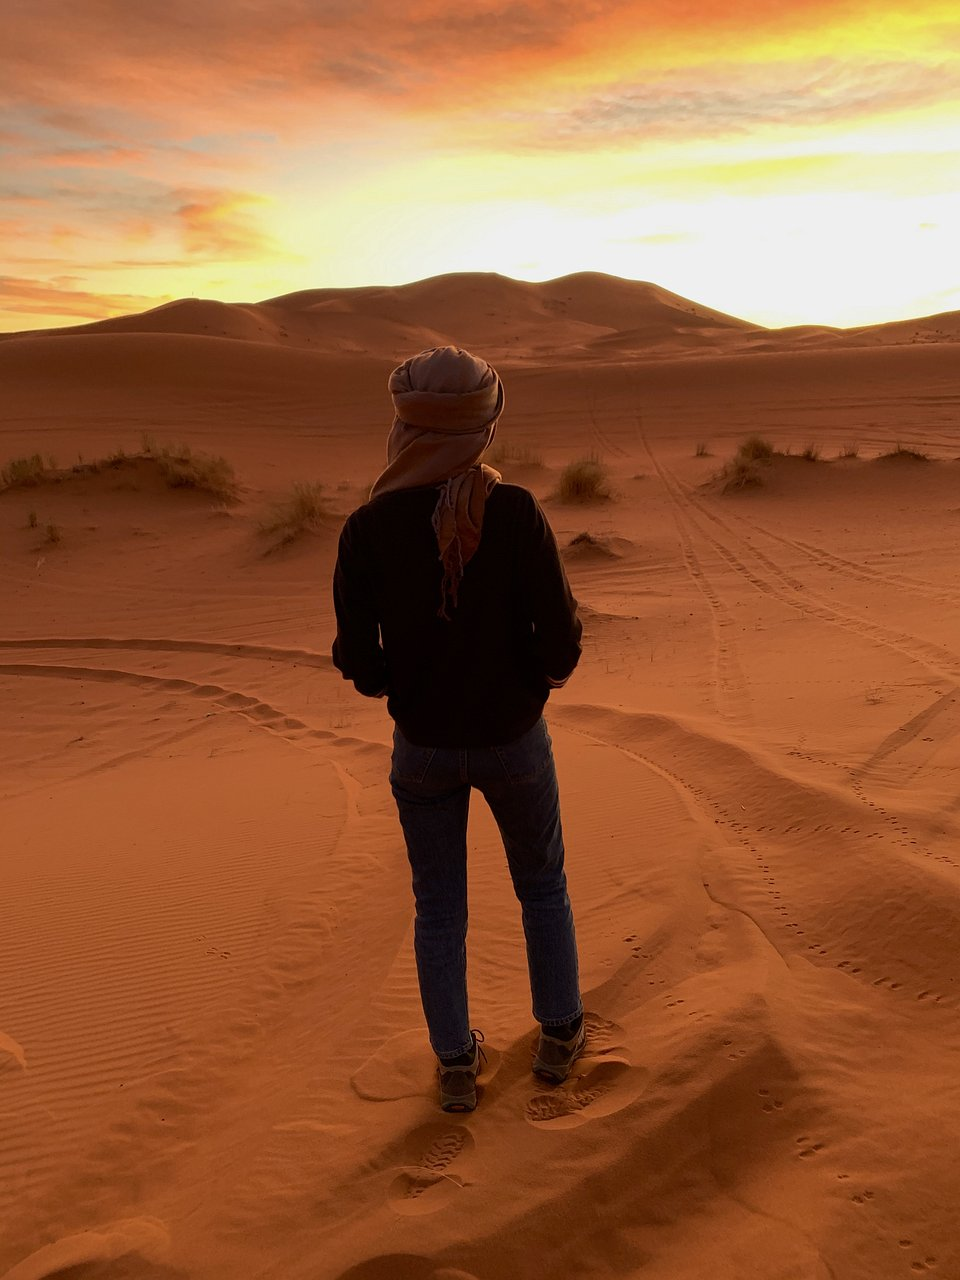 Location: Merzouga desert, Morocco